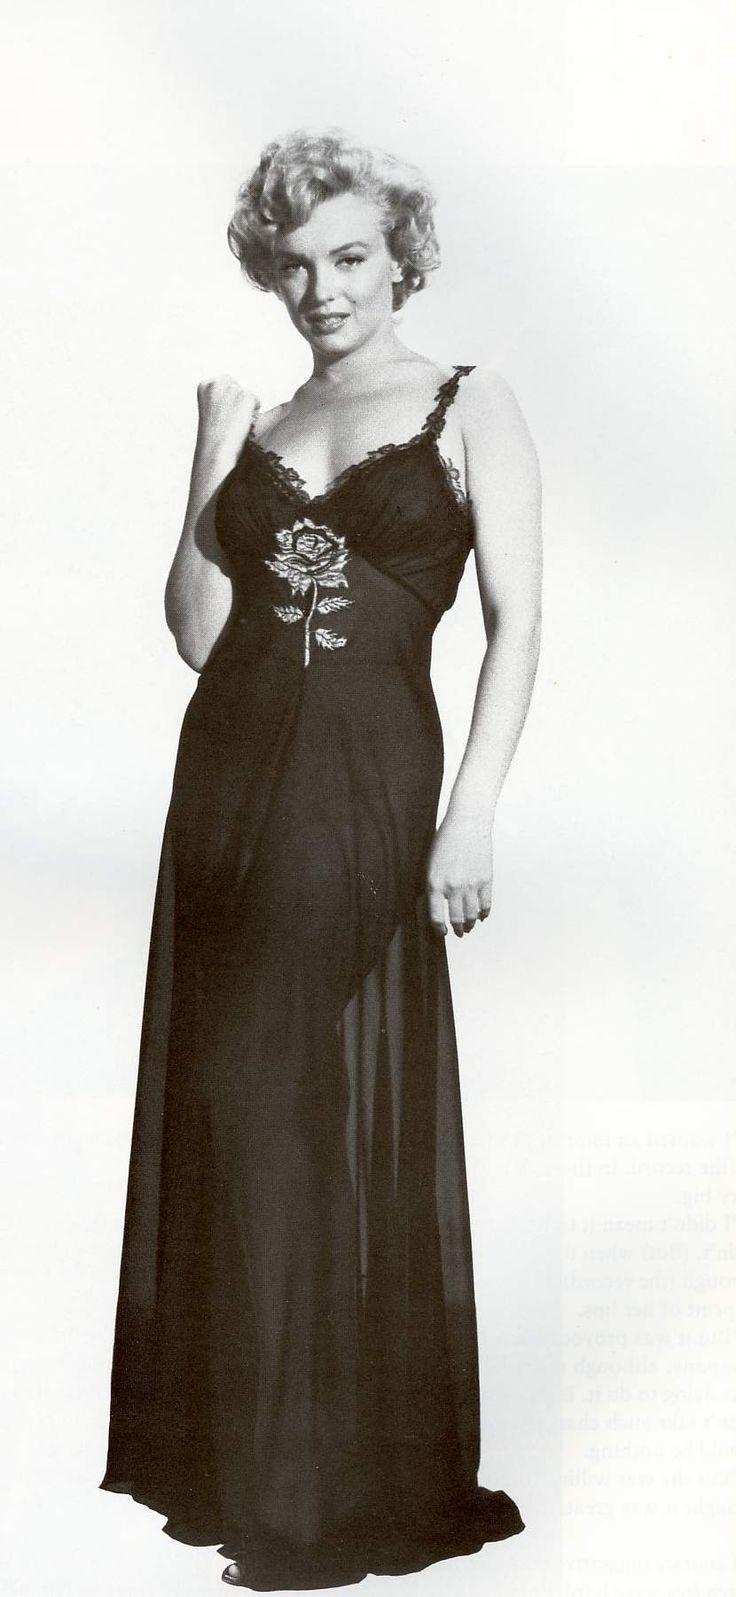 303 best Fashion: Celebrity images on Pinterest | Costume ...